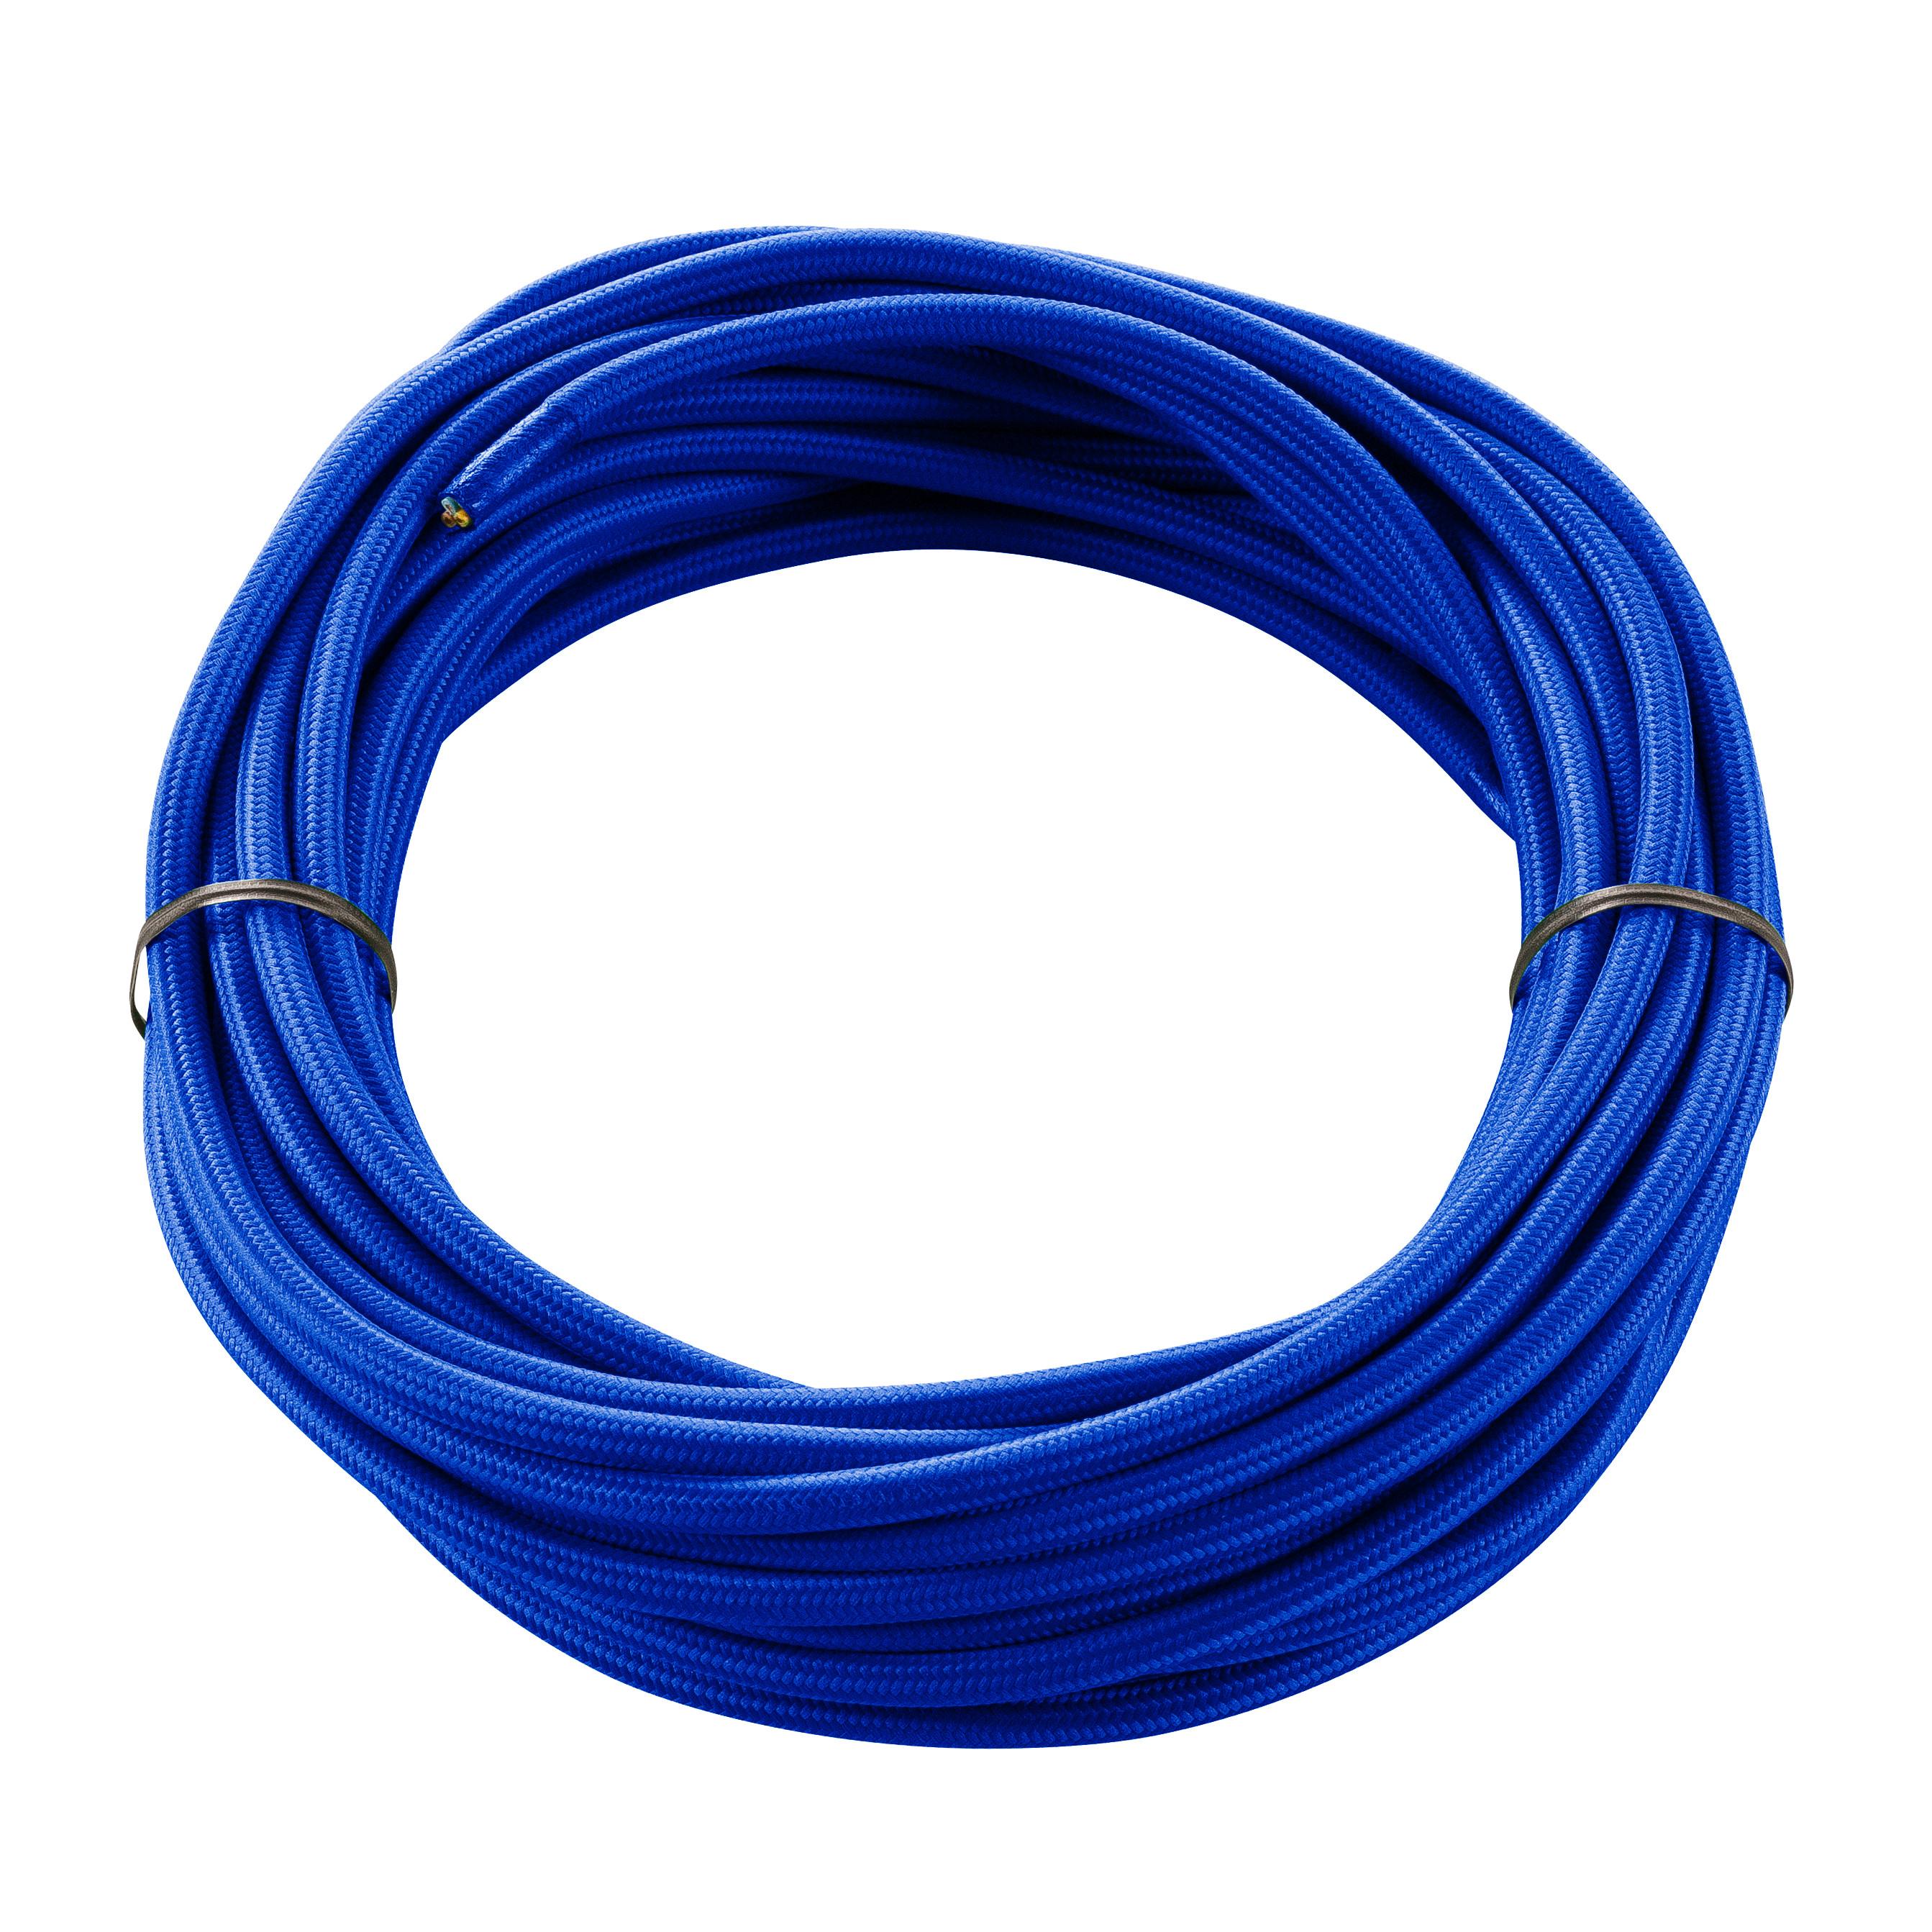 1 Stk TEXTILKABEL, 3-polig, 10 m, blau LI961273--